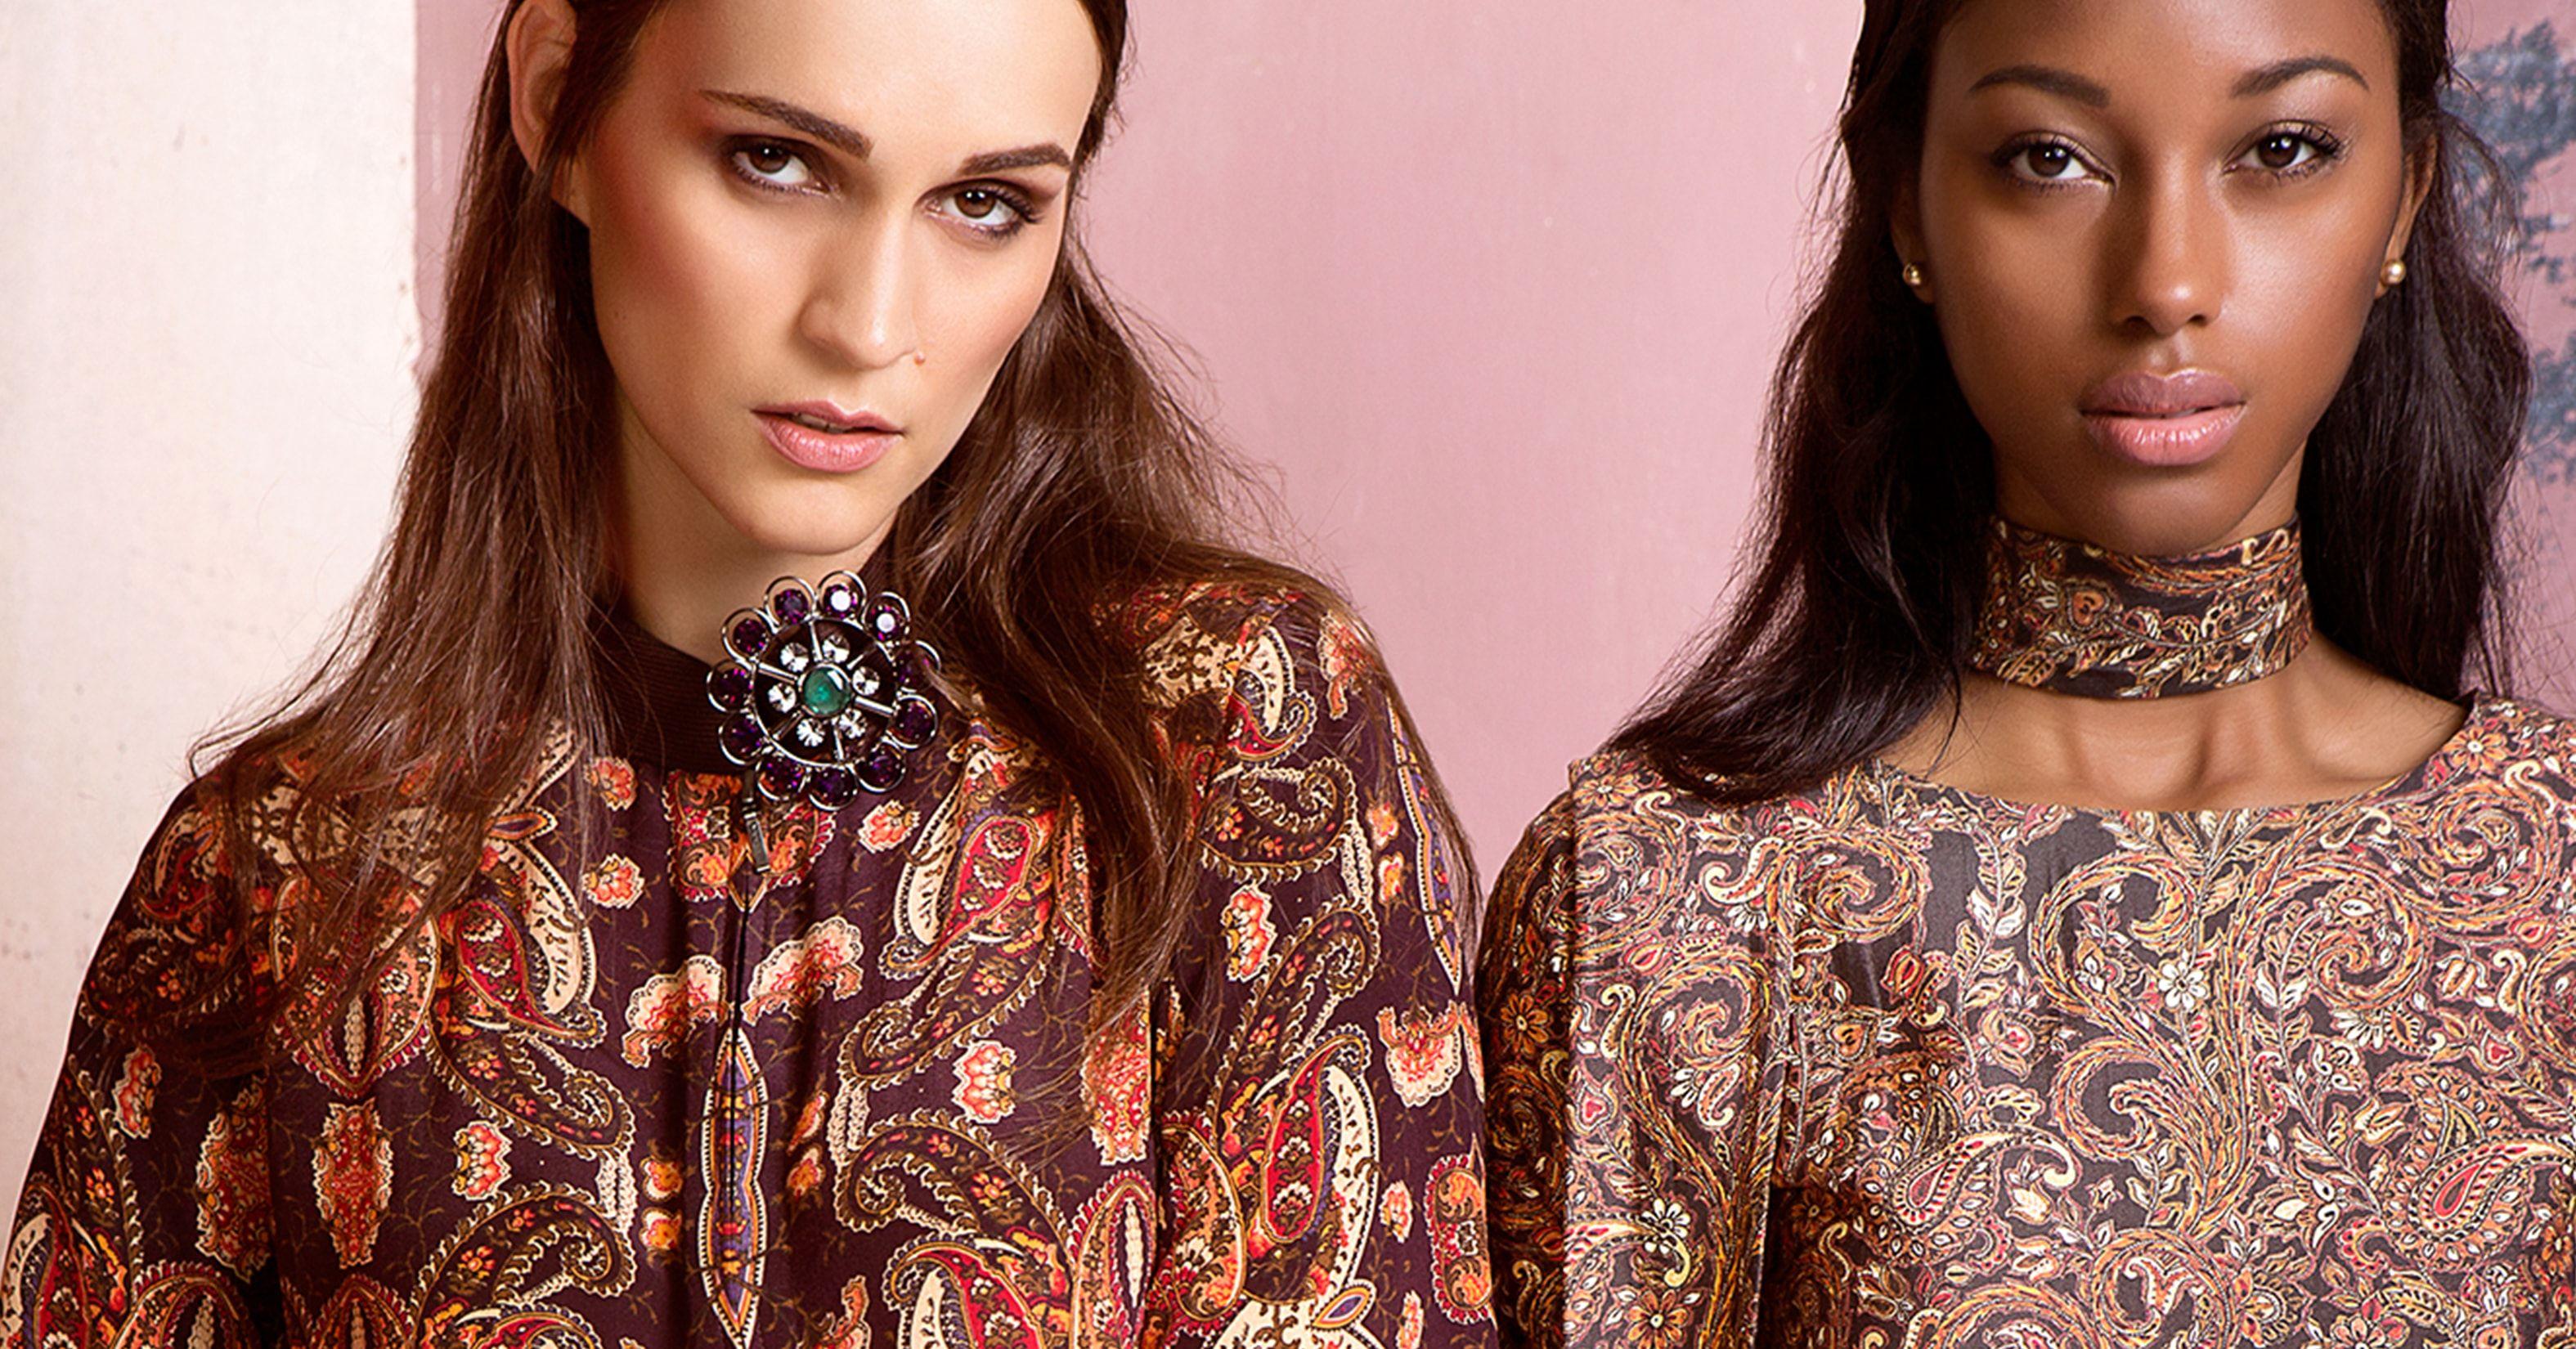 In_The_Spotlight_Shruti_Sancheti_Blog_Featured_Image_Fashion_Style